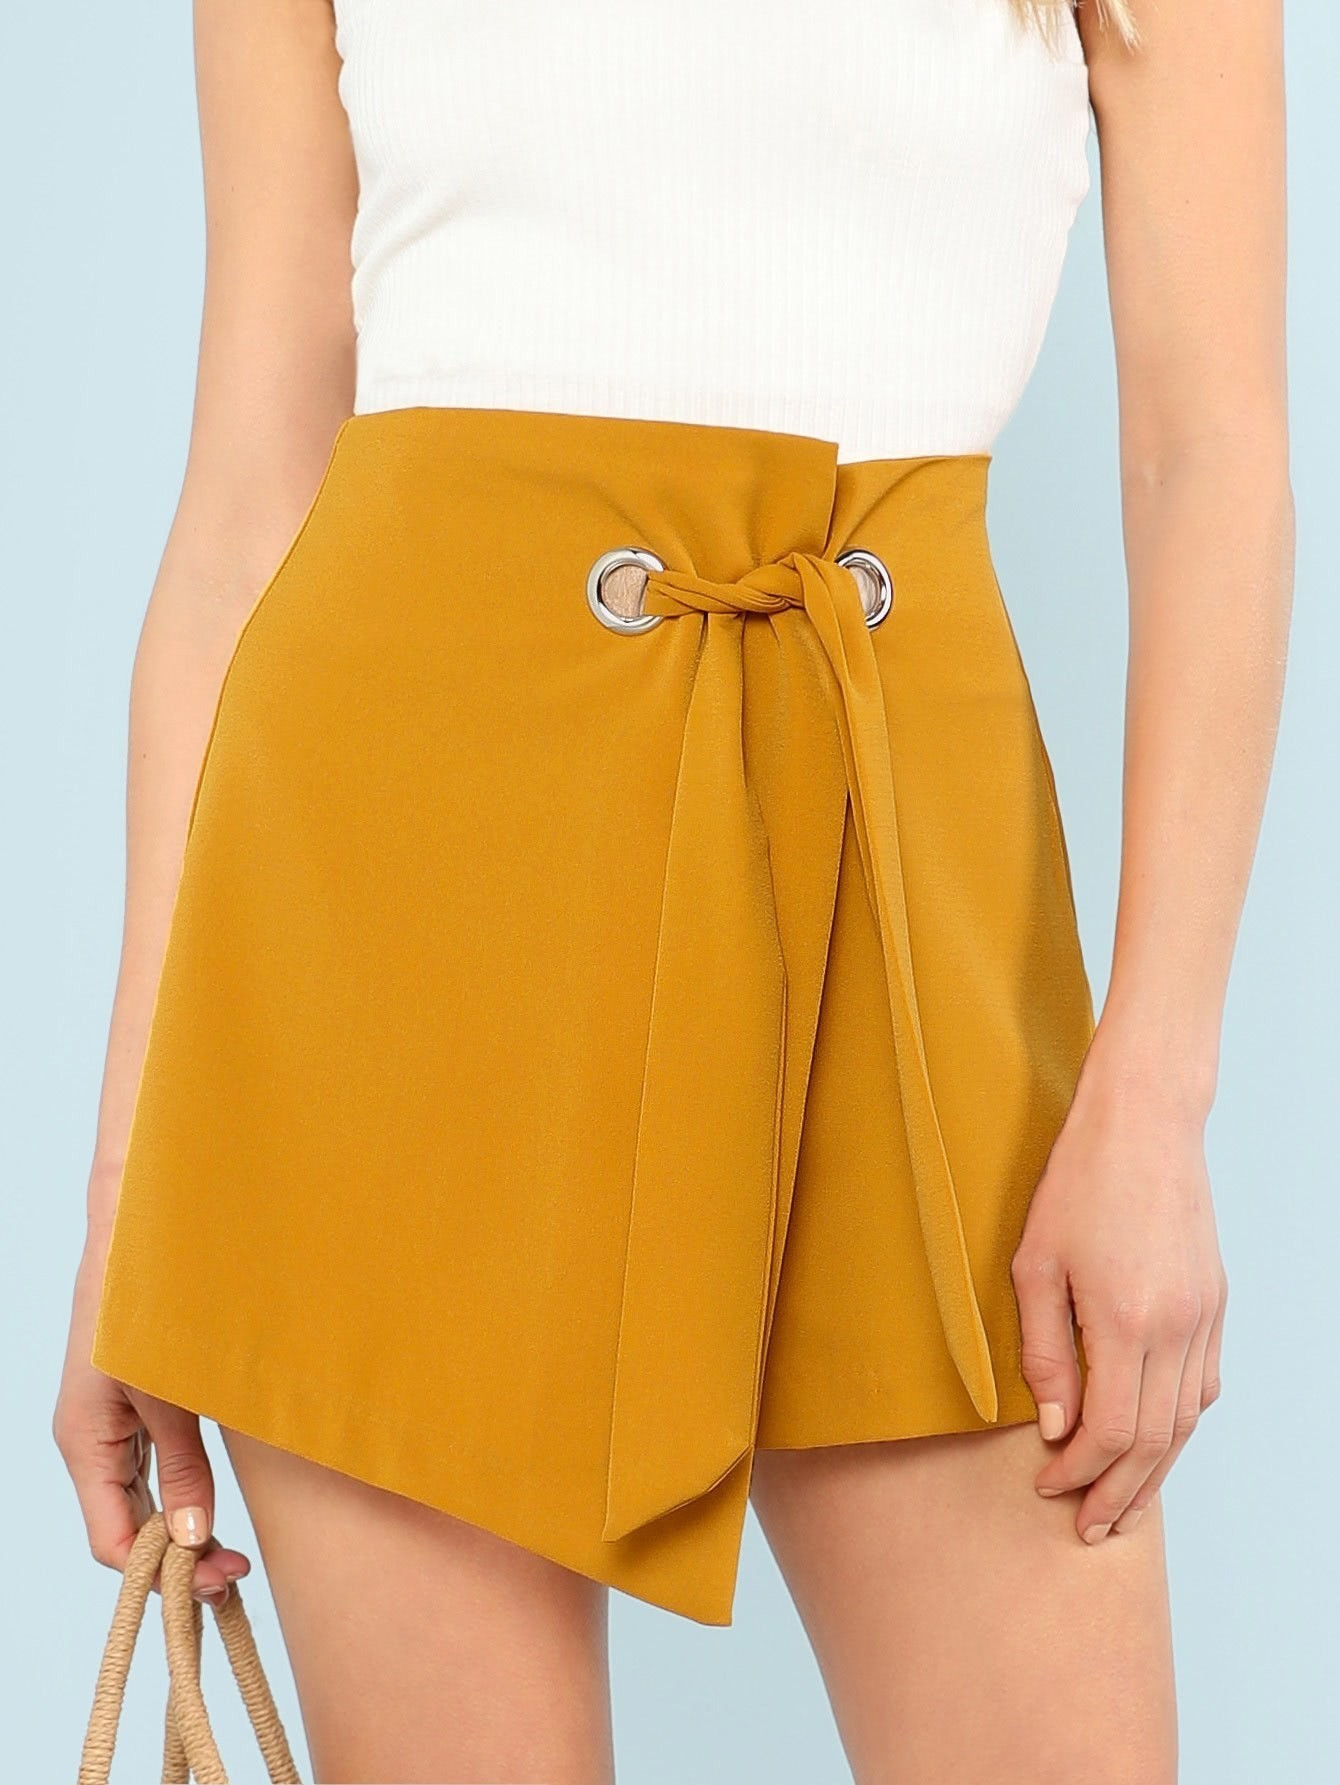 Купить Ассиметричная юбка шорты с кольцом, Allie Leggett, SheIn